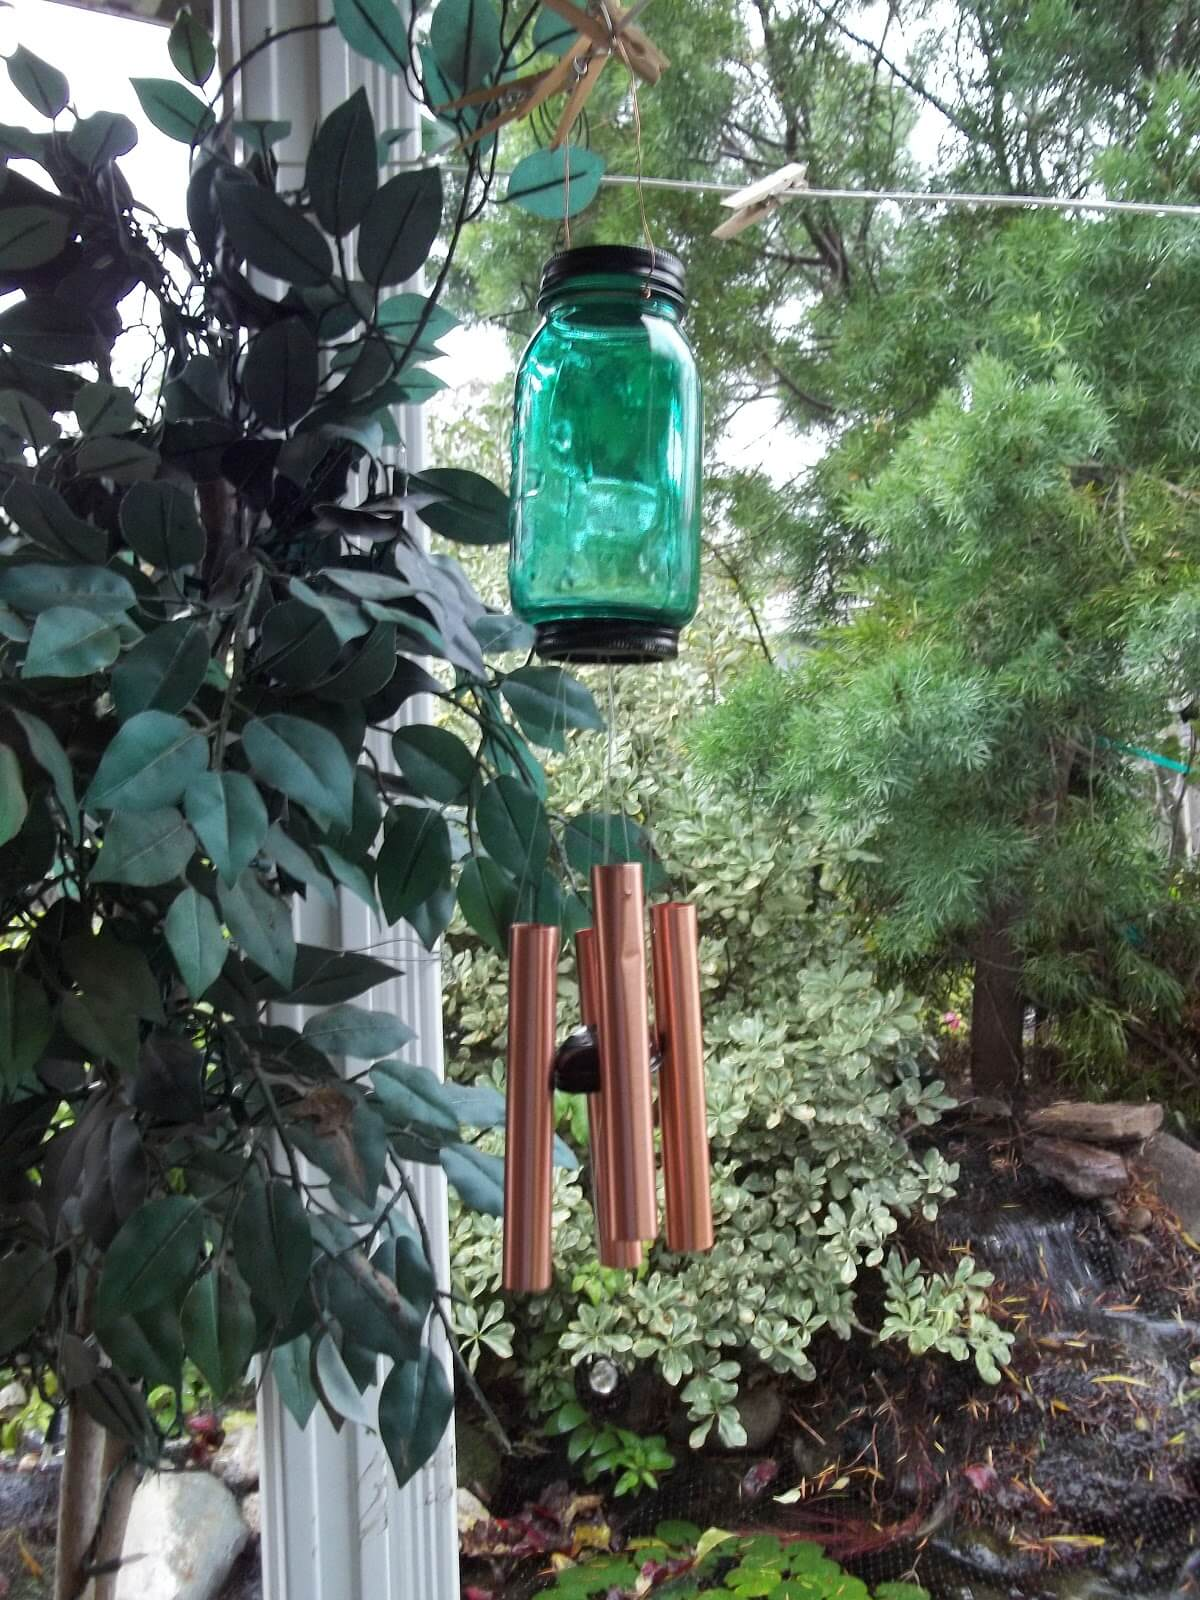 Mason Jar Wind Chimes for a Garden Paradise